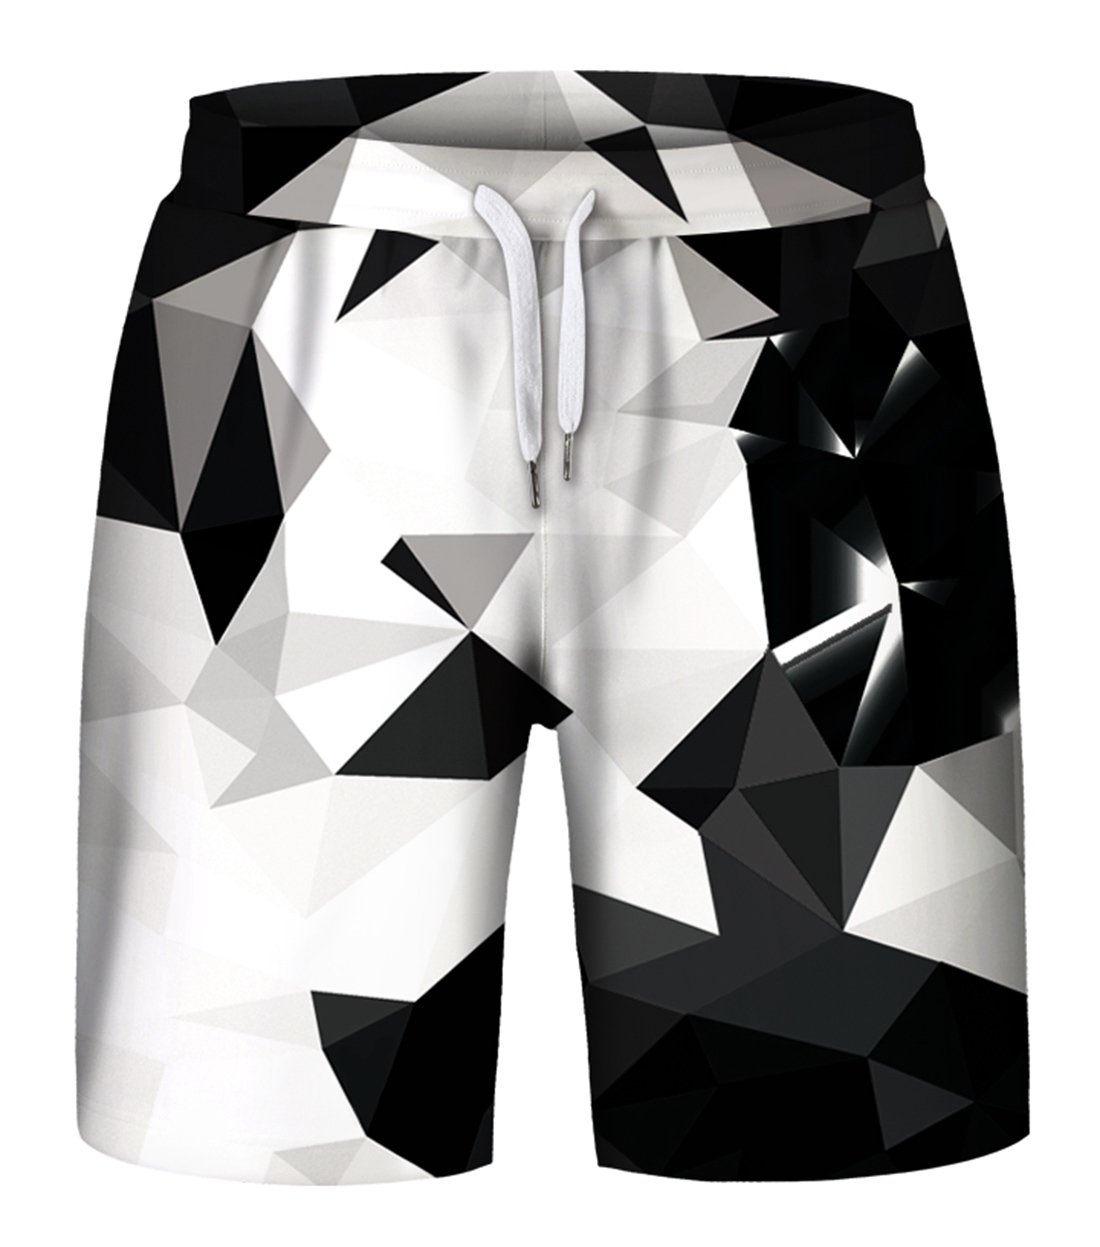 Aieoe Print Drawstring Summer Shorts Fashion Casual Board Shorts for Mens Workout Swim Gym Trips 2XL